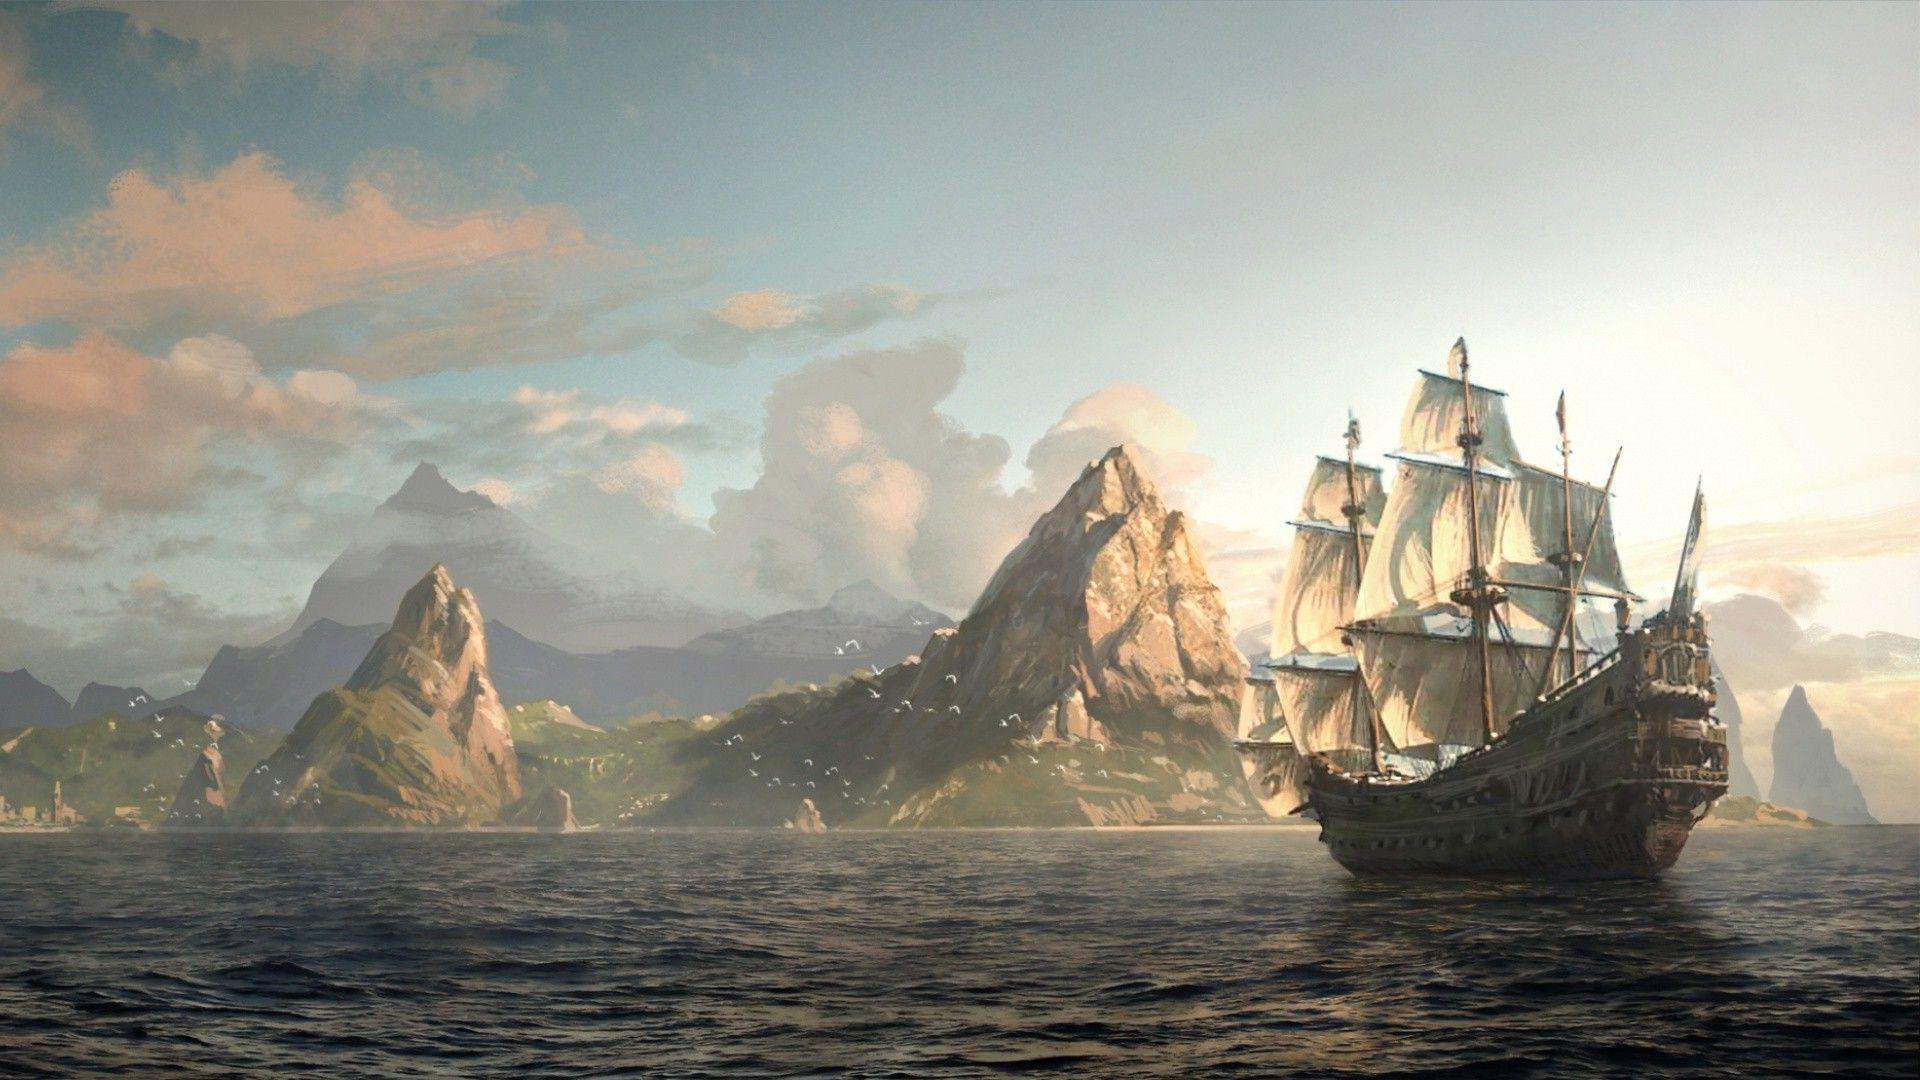 1 50 Carat Champagne Diamond Free Classifieds Cornerclassifieds Com Assassins Creed Black Flag Assassin S Creed Black Assassin S Creed Wallpaper